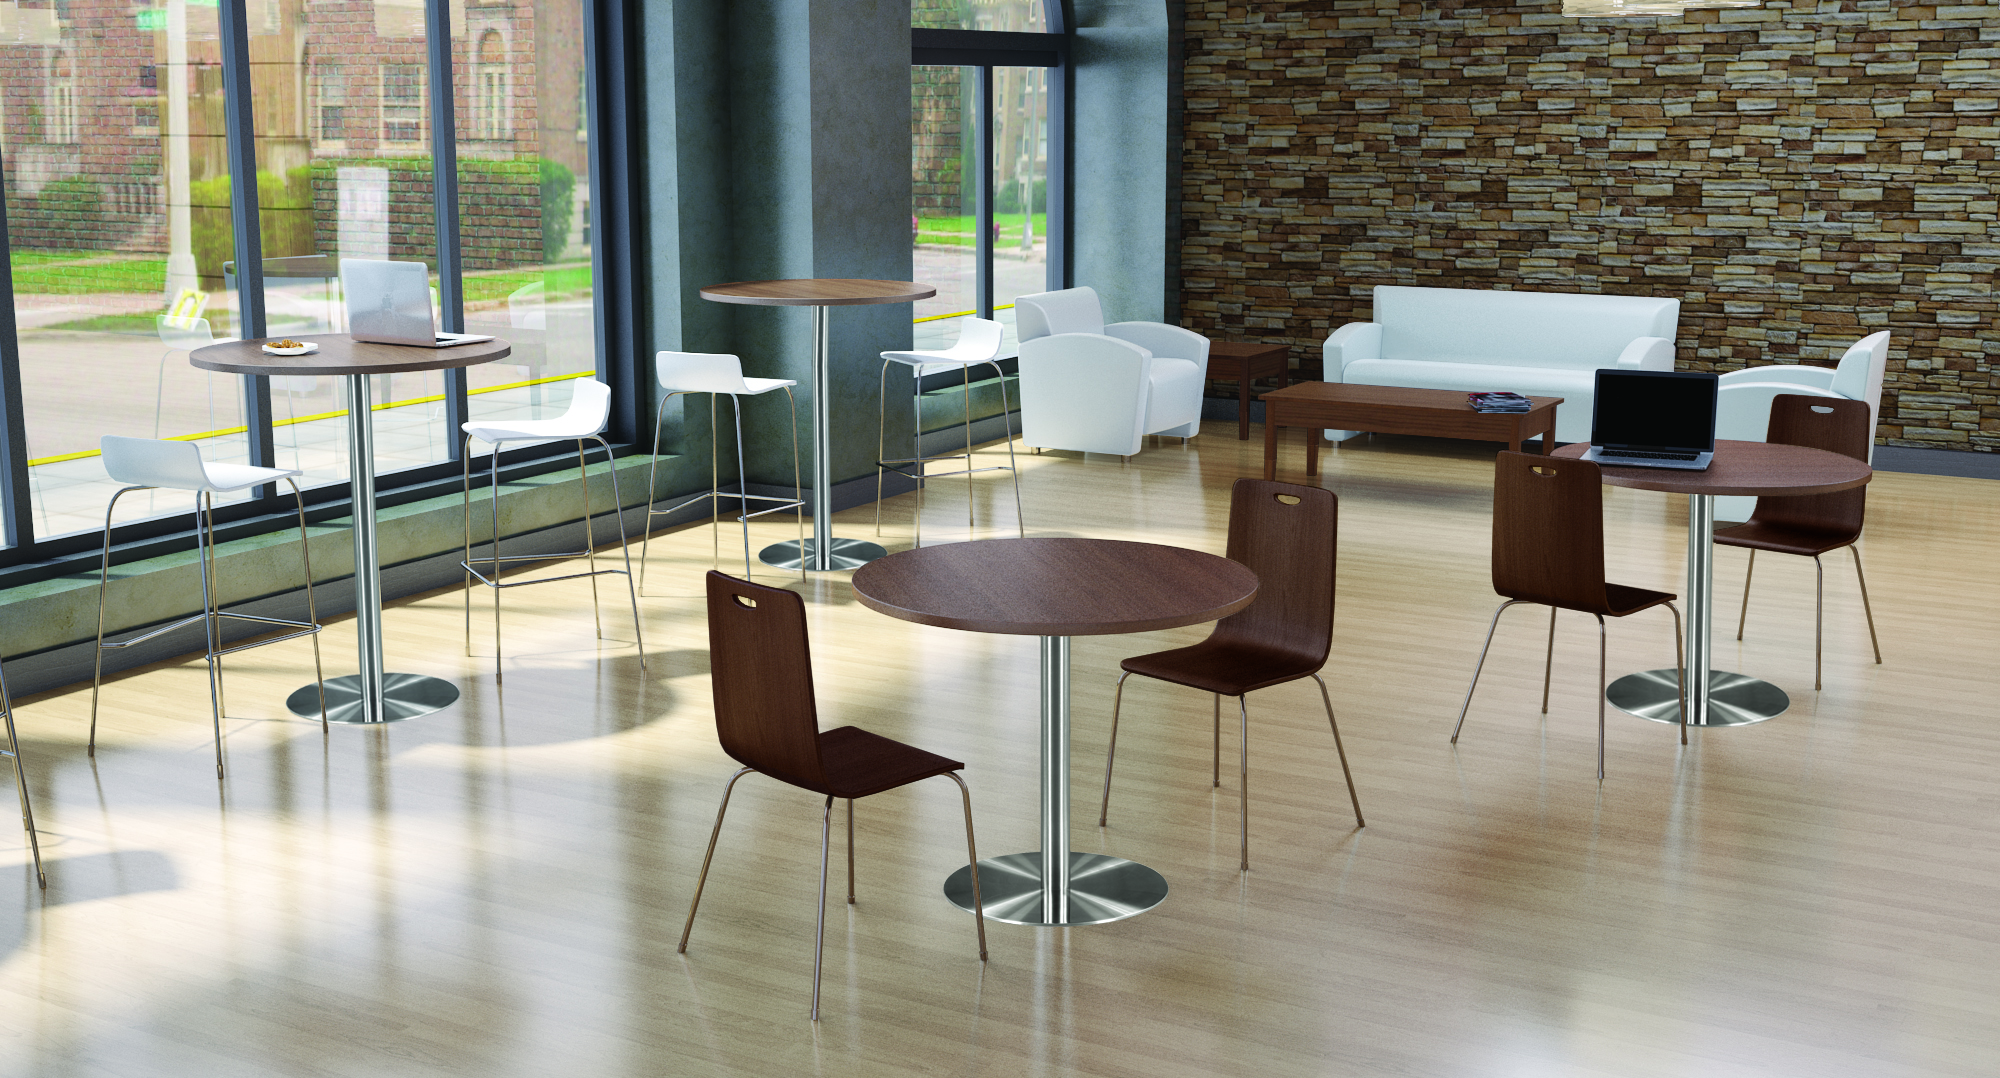 PER BLEECKER ENVIRONMENT offered by Indoff Office Interiors.jpg